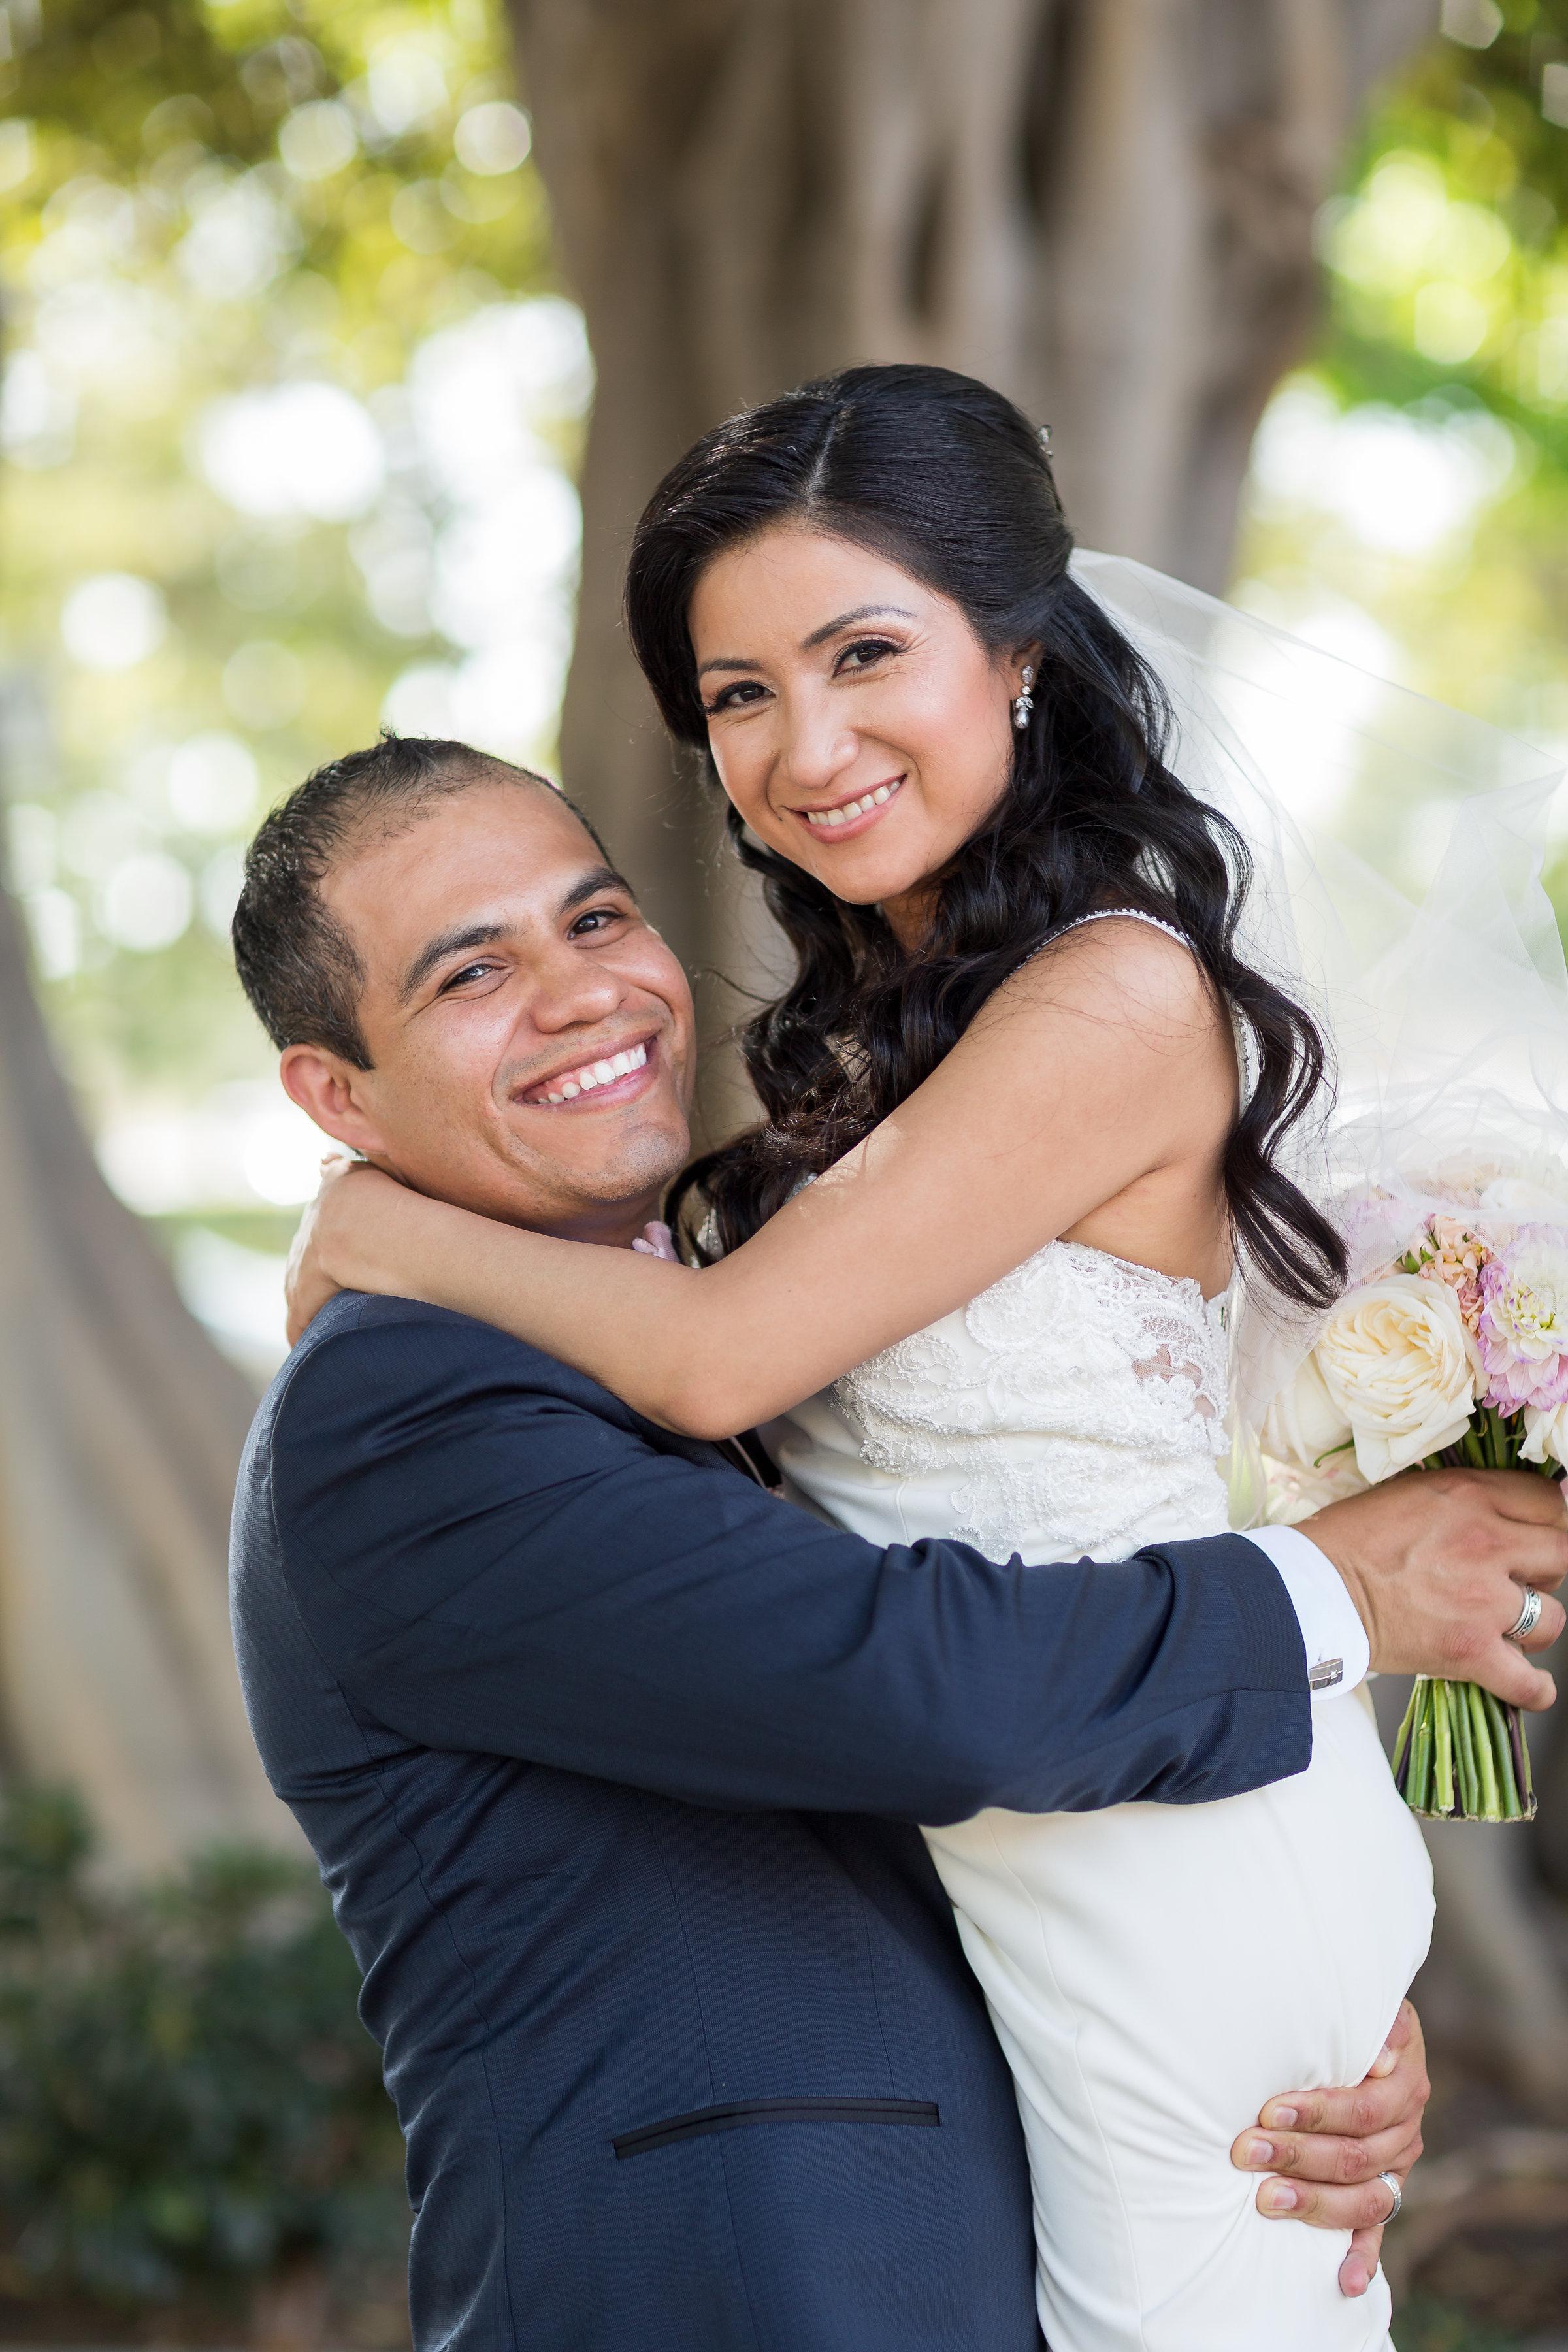 Photo of Happy Groom Lifting Happy Bride.jpg